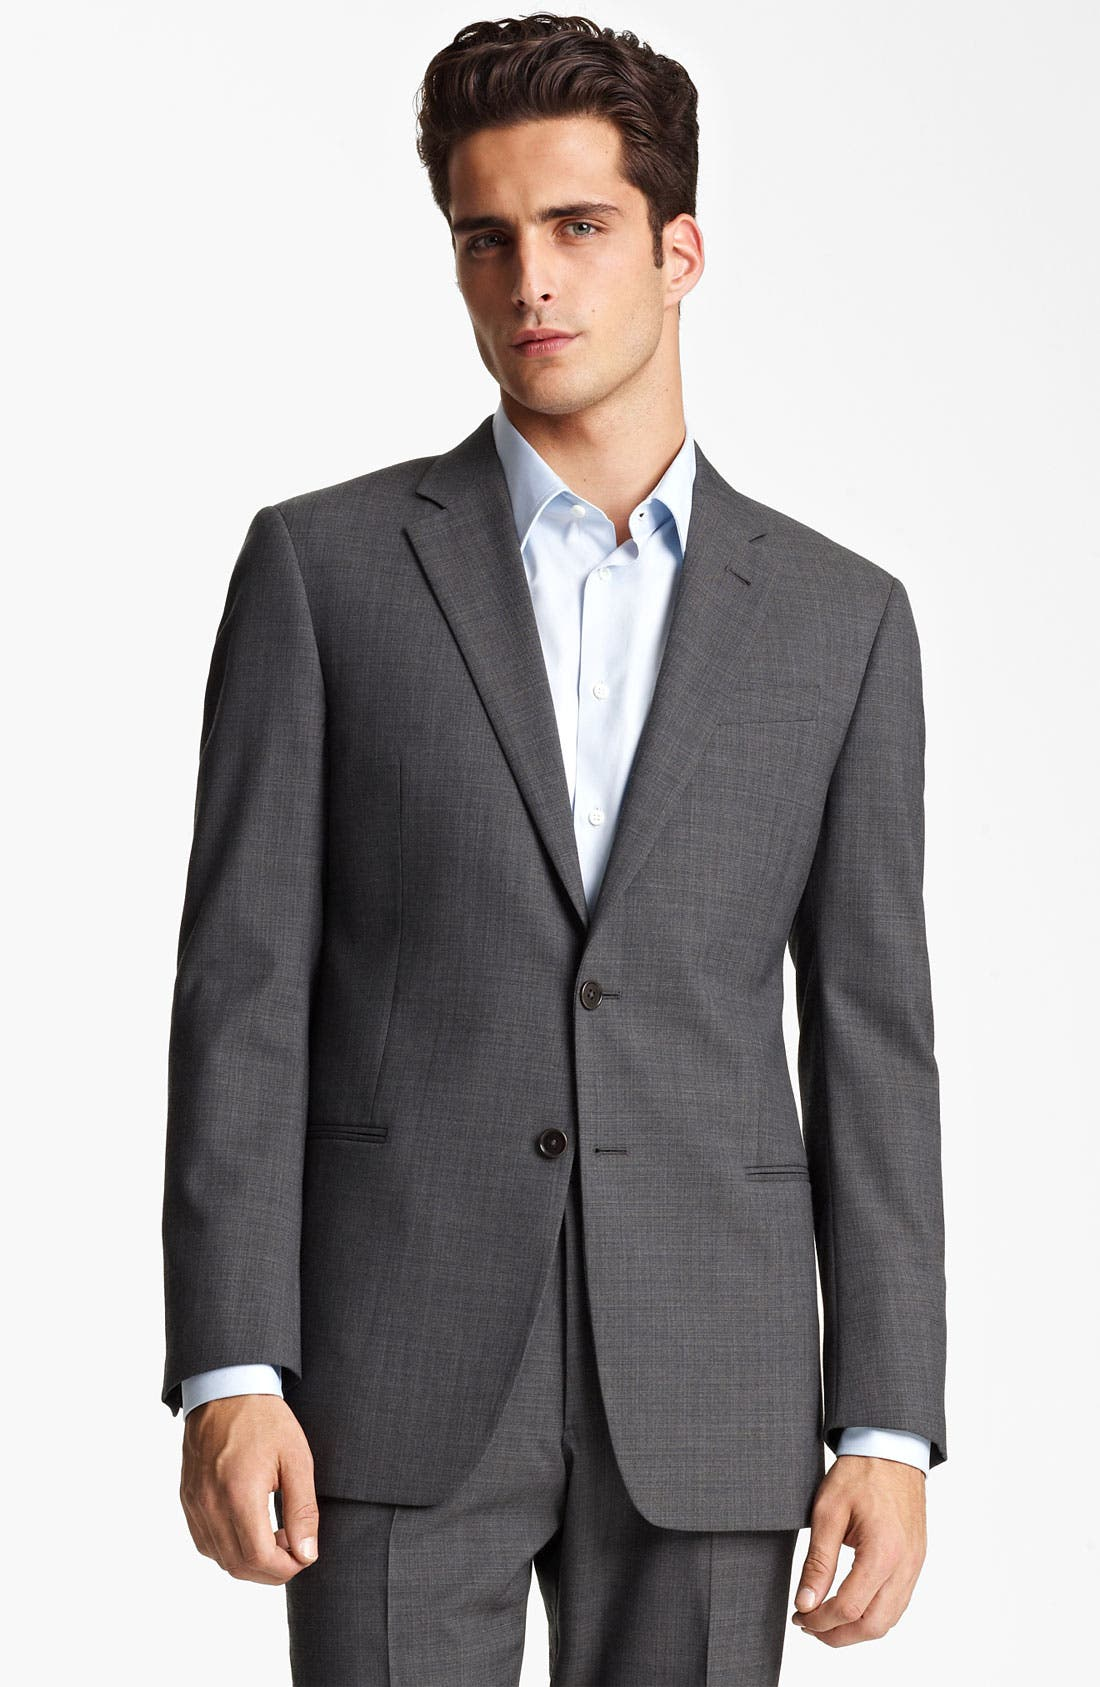 Alternate Image 1 Selected - Armani Collezioni Trim Fit Wool Blend Suit